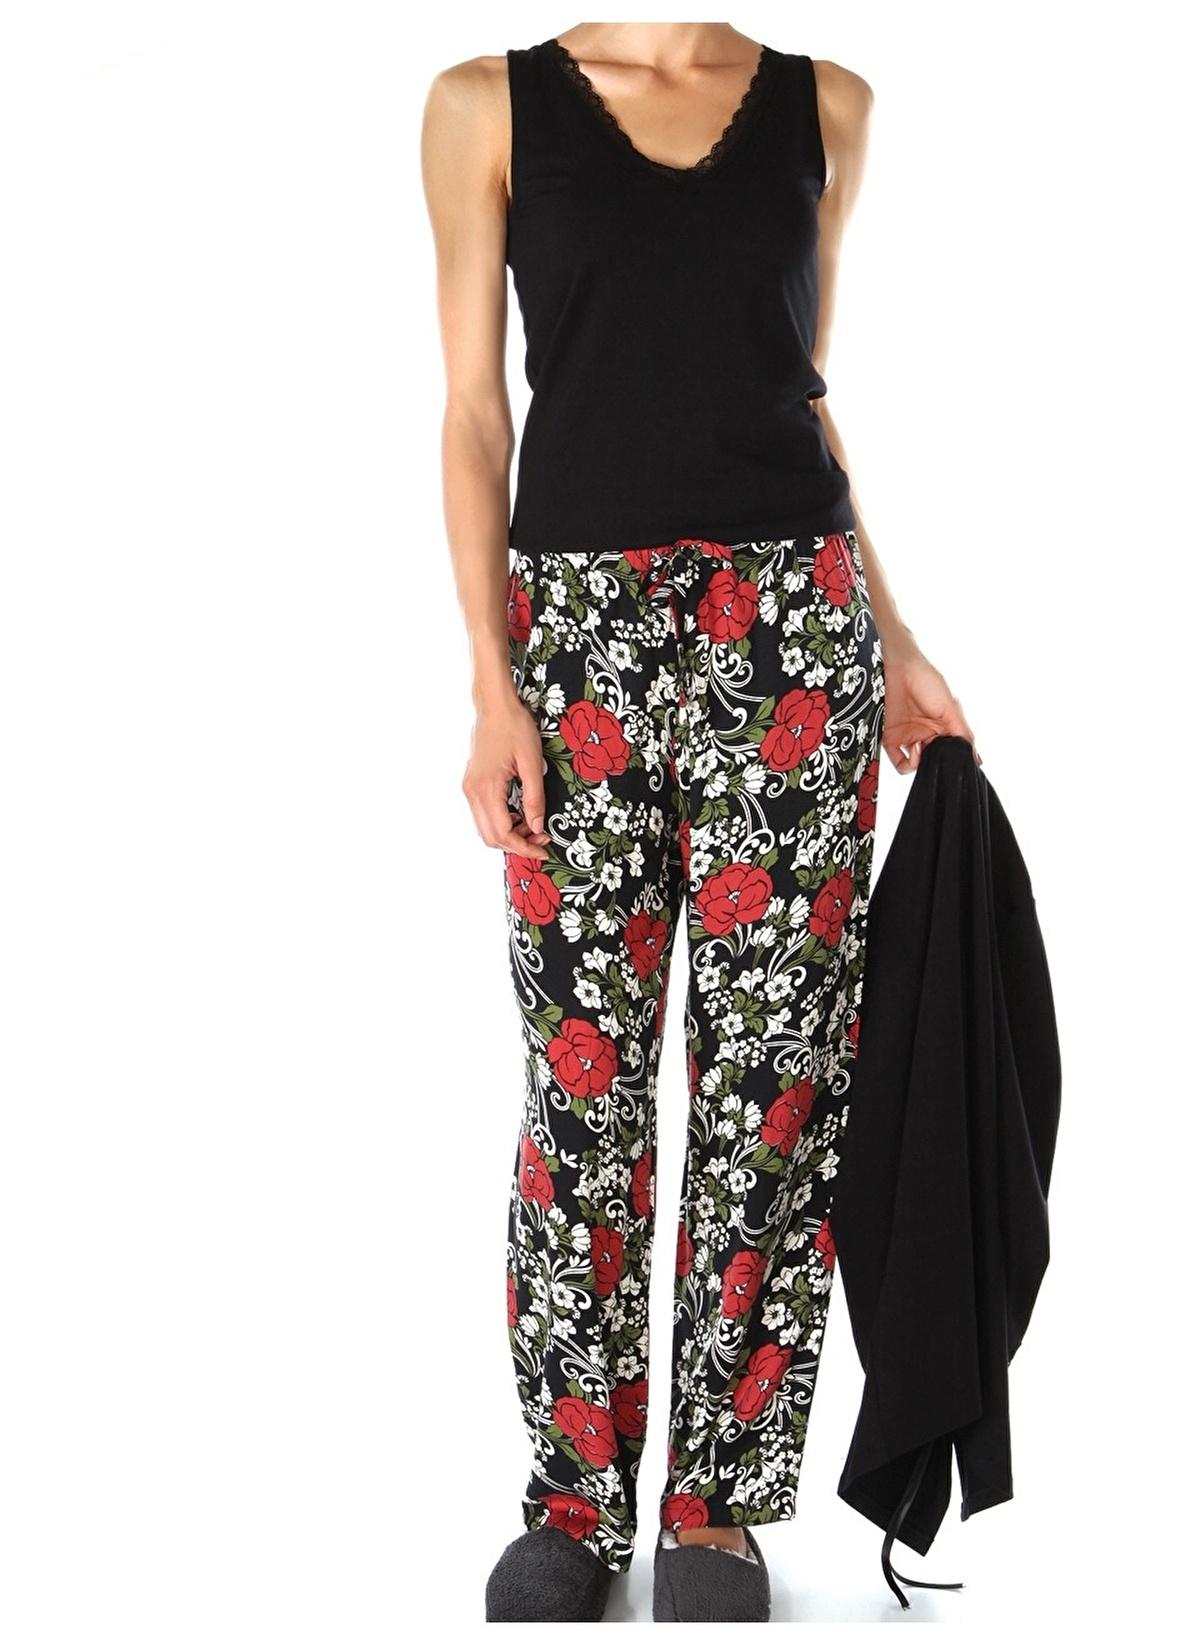 Doremi Pijama Takım 002-000221 Flower Garden 3'lü Pijama Tak – 186.99 TL